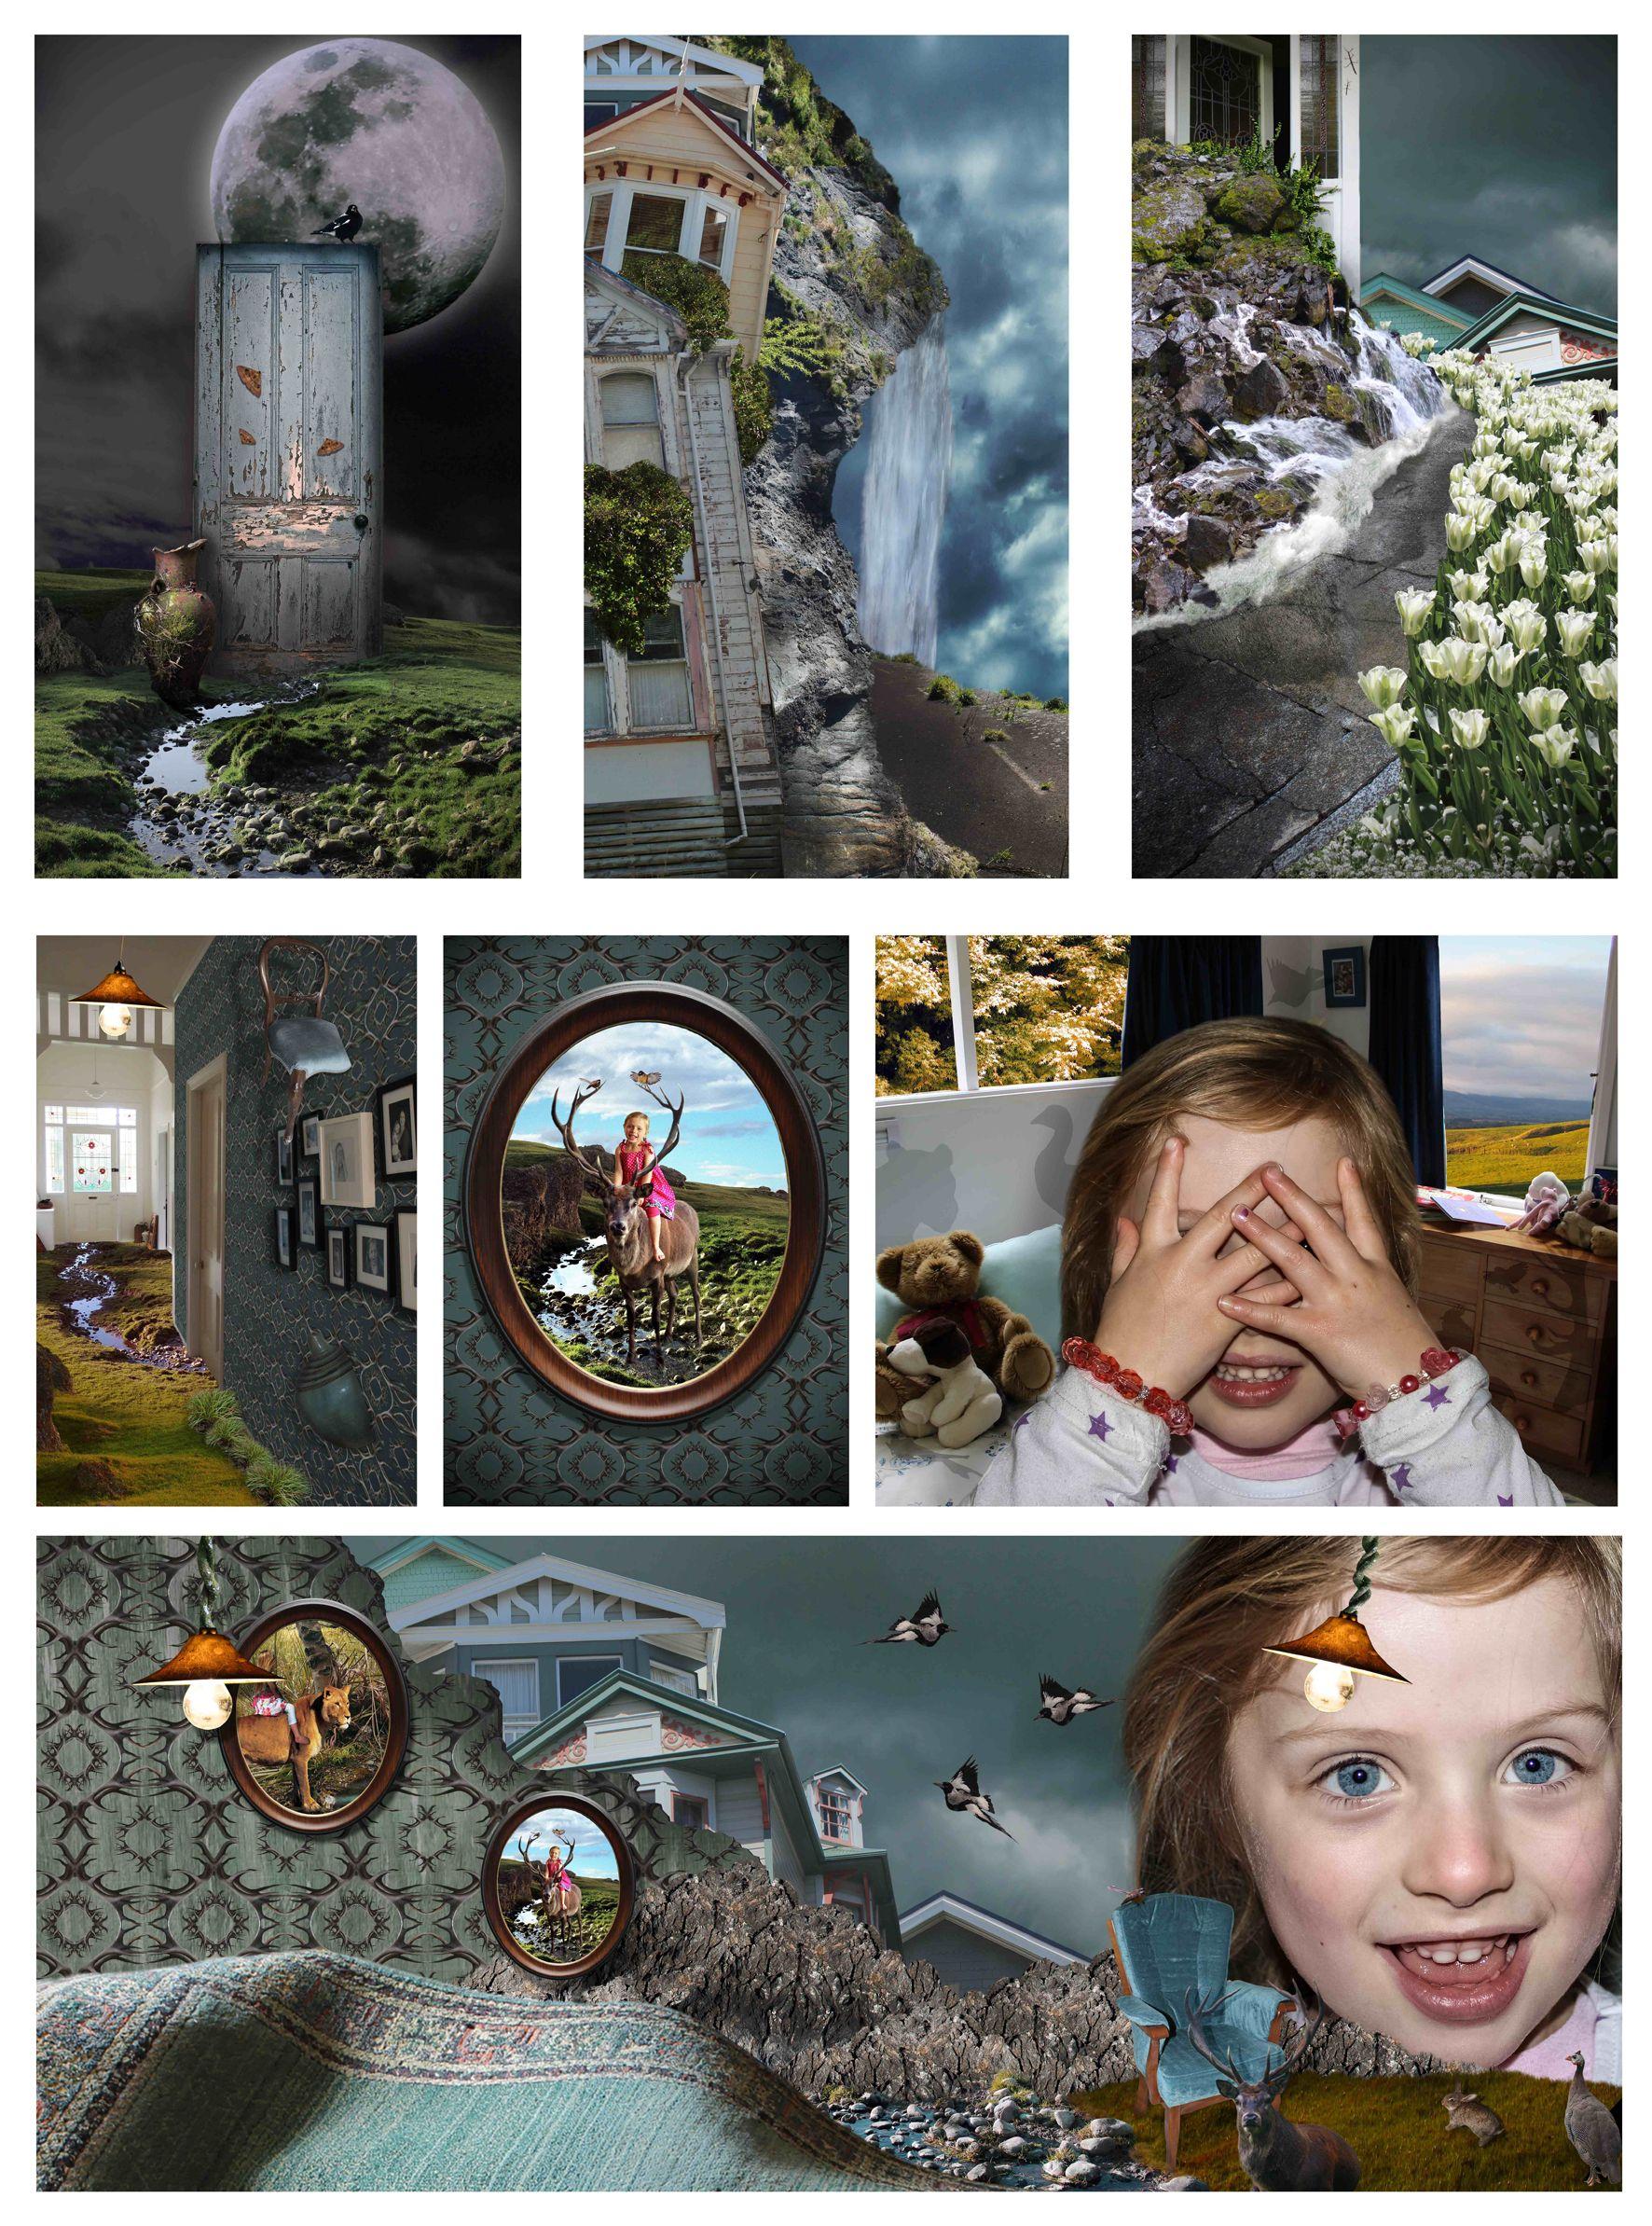 Photography portfolio for college 2018 graphic design portfolio.